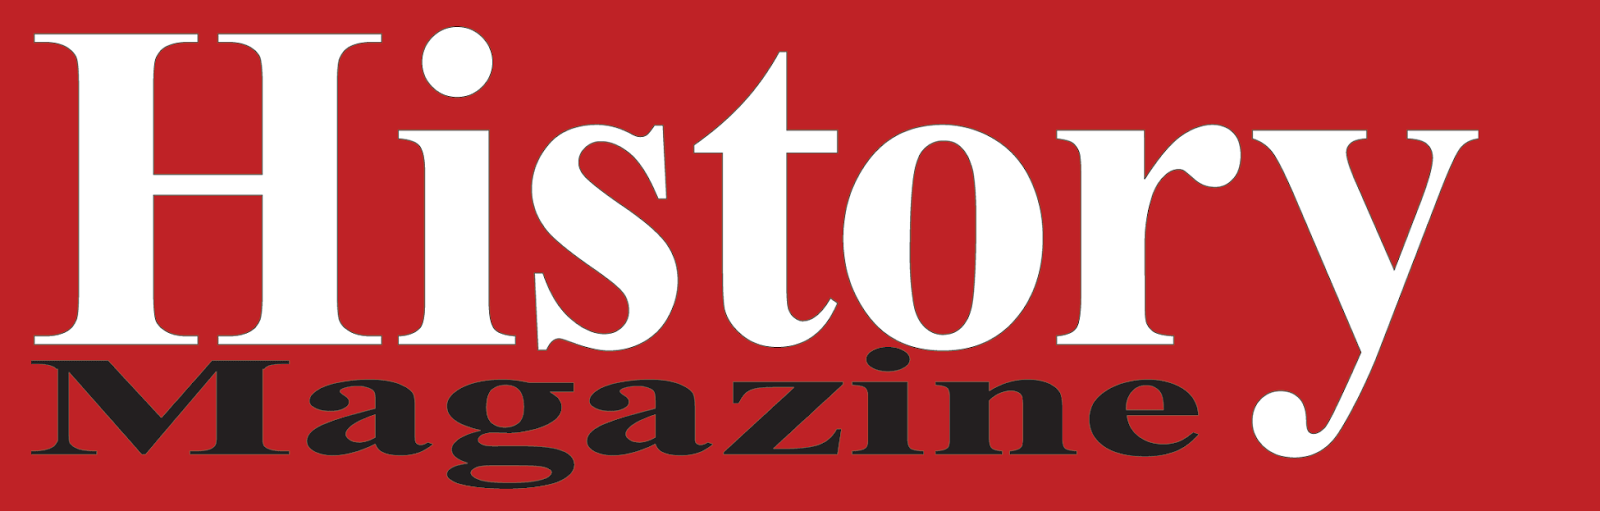 Image of History Magazine banner